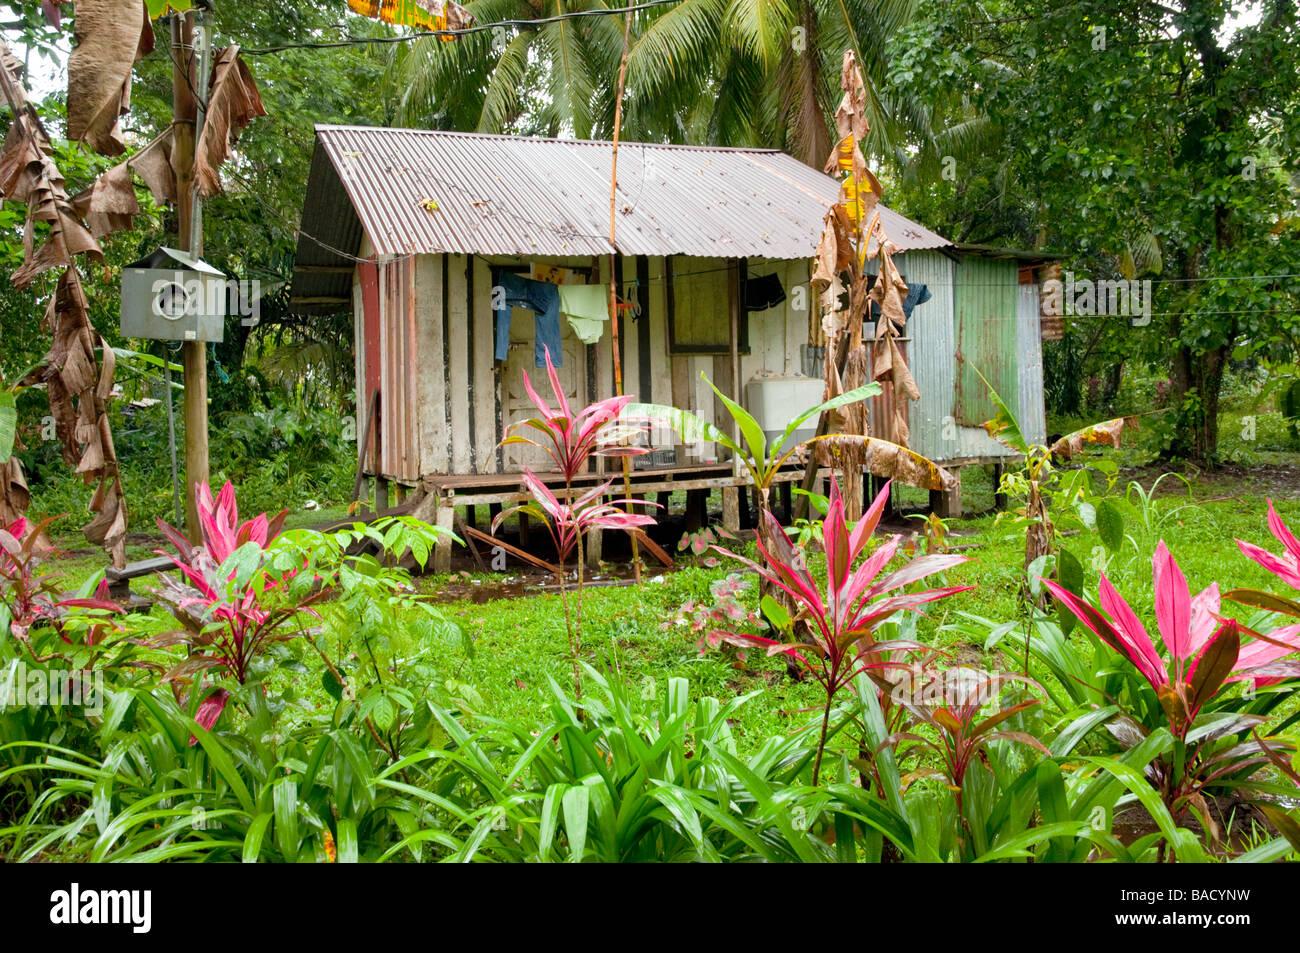 the modest pastel colored homes in tortuguero costa rica